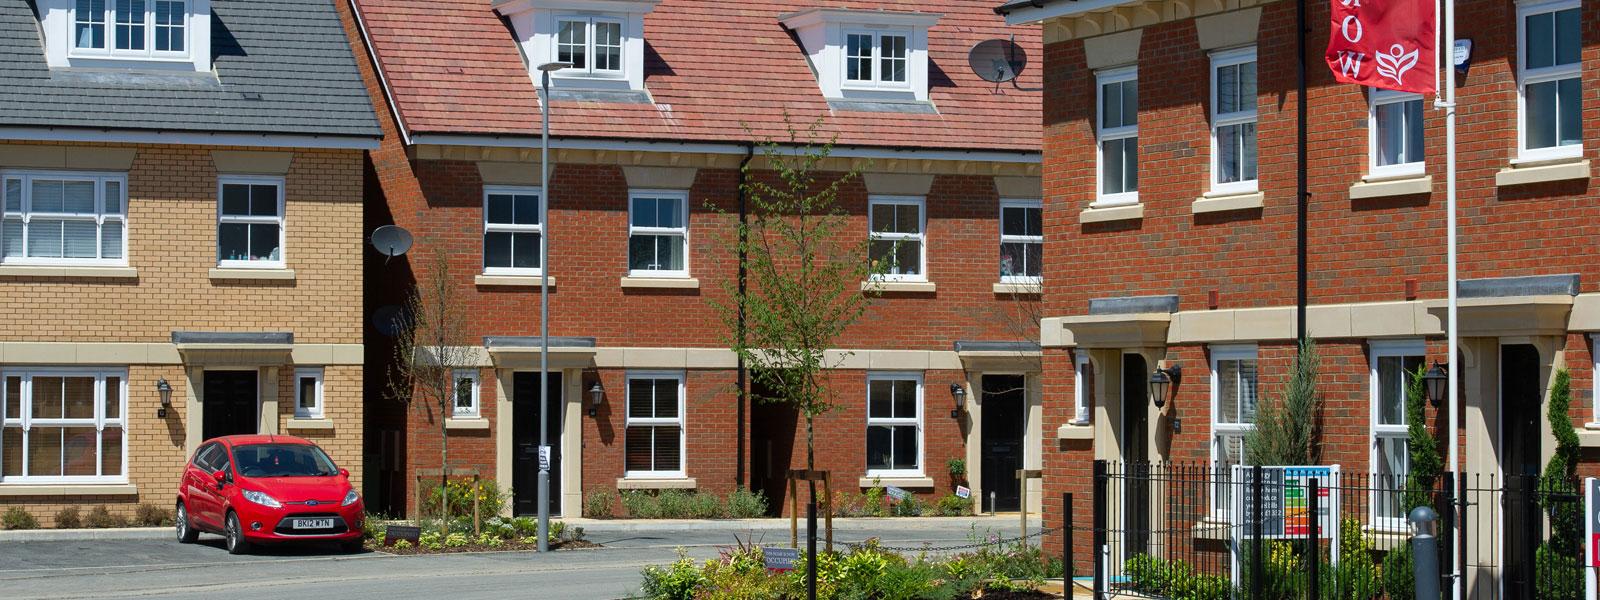 Mark Liell Case Studies - Residential Land